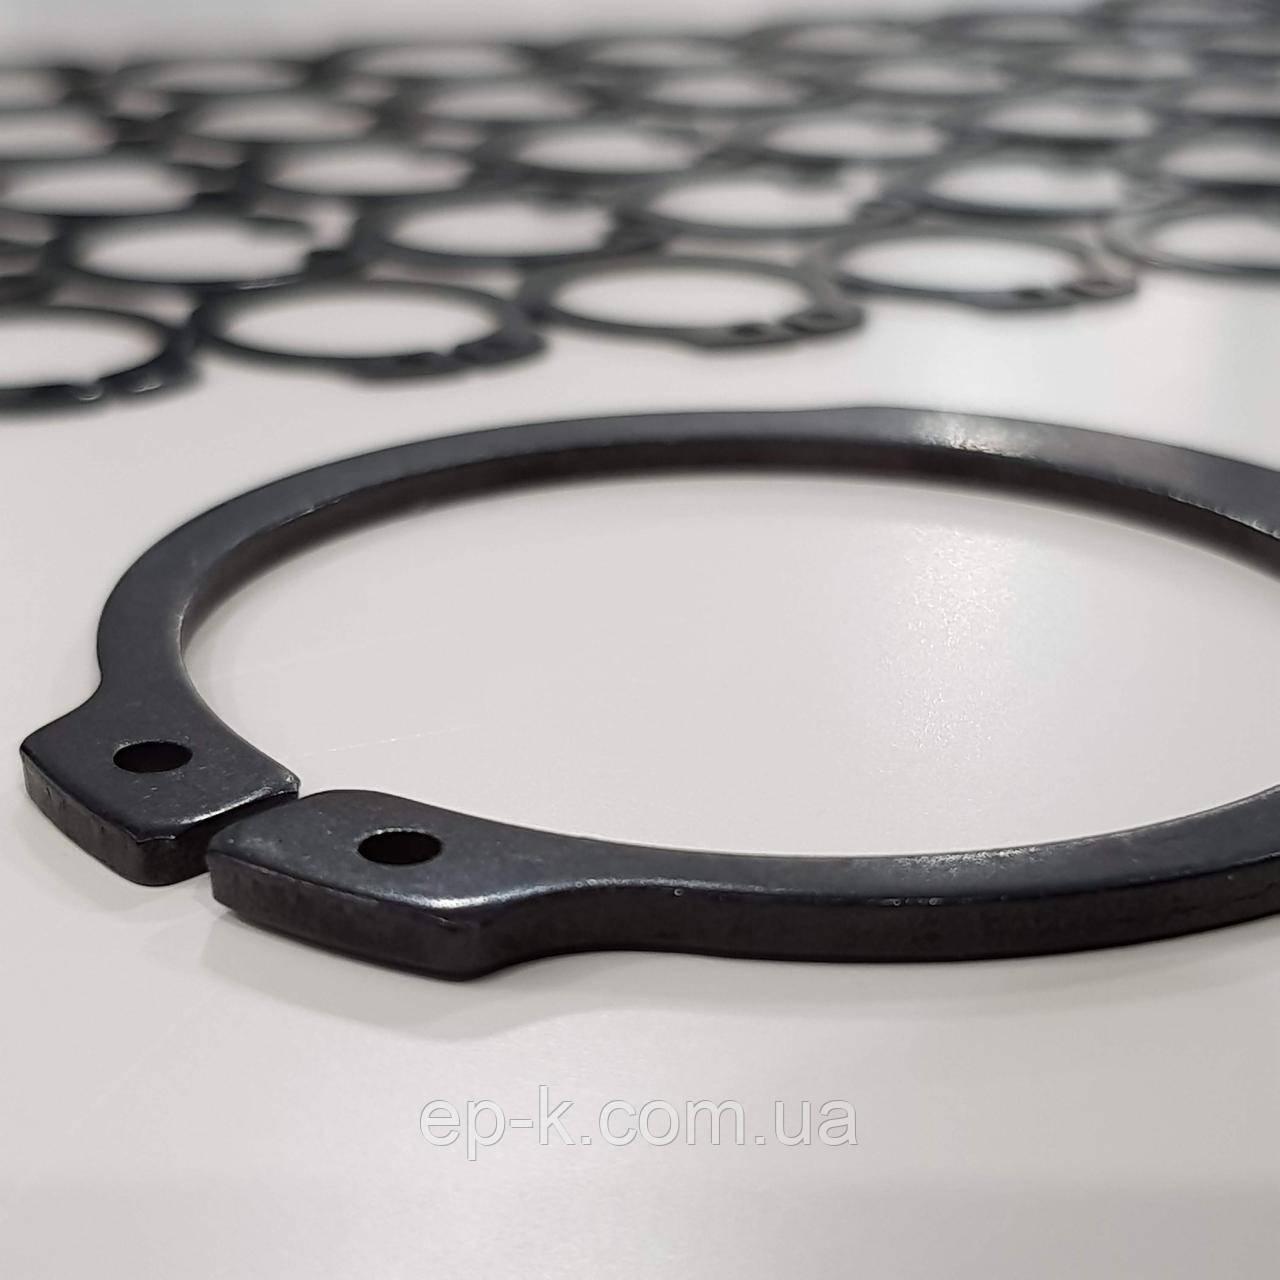 Стопорное кольцо наружное А17 ГОСТ 13942-86, DIN 471